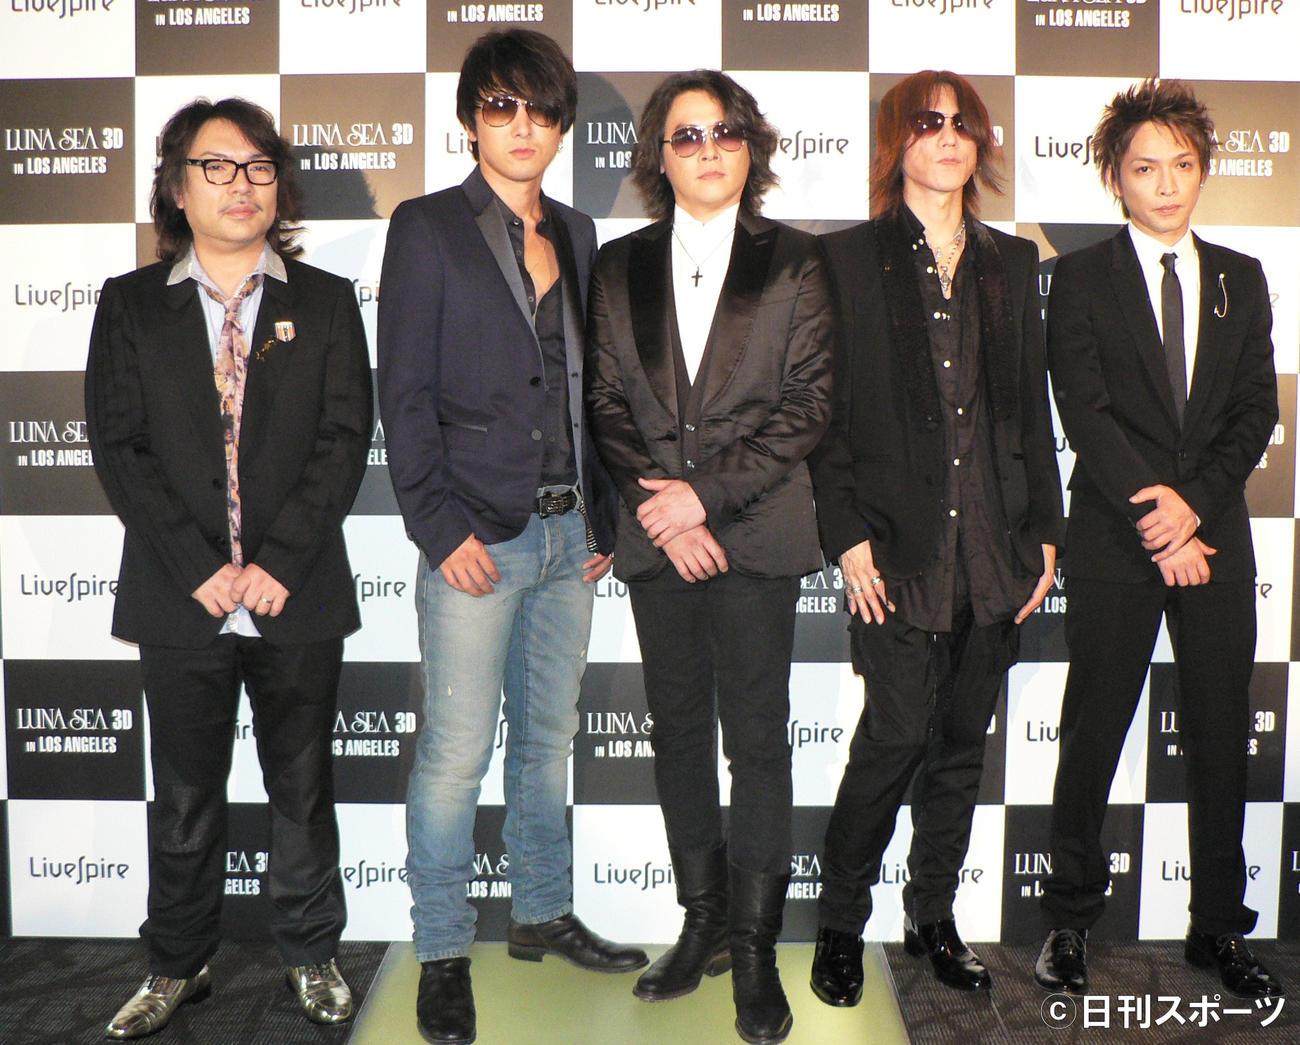 LUNA SEA左から真矢、J、RYUICHI、SUGIZO、INORAN(2011年5月29日撮影)